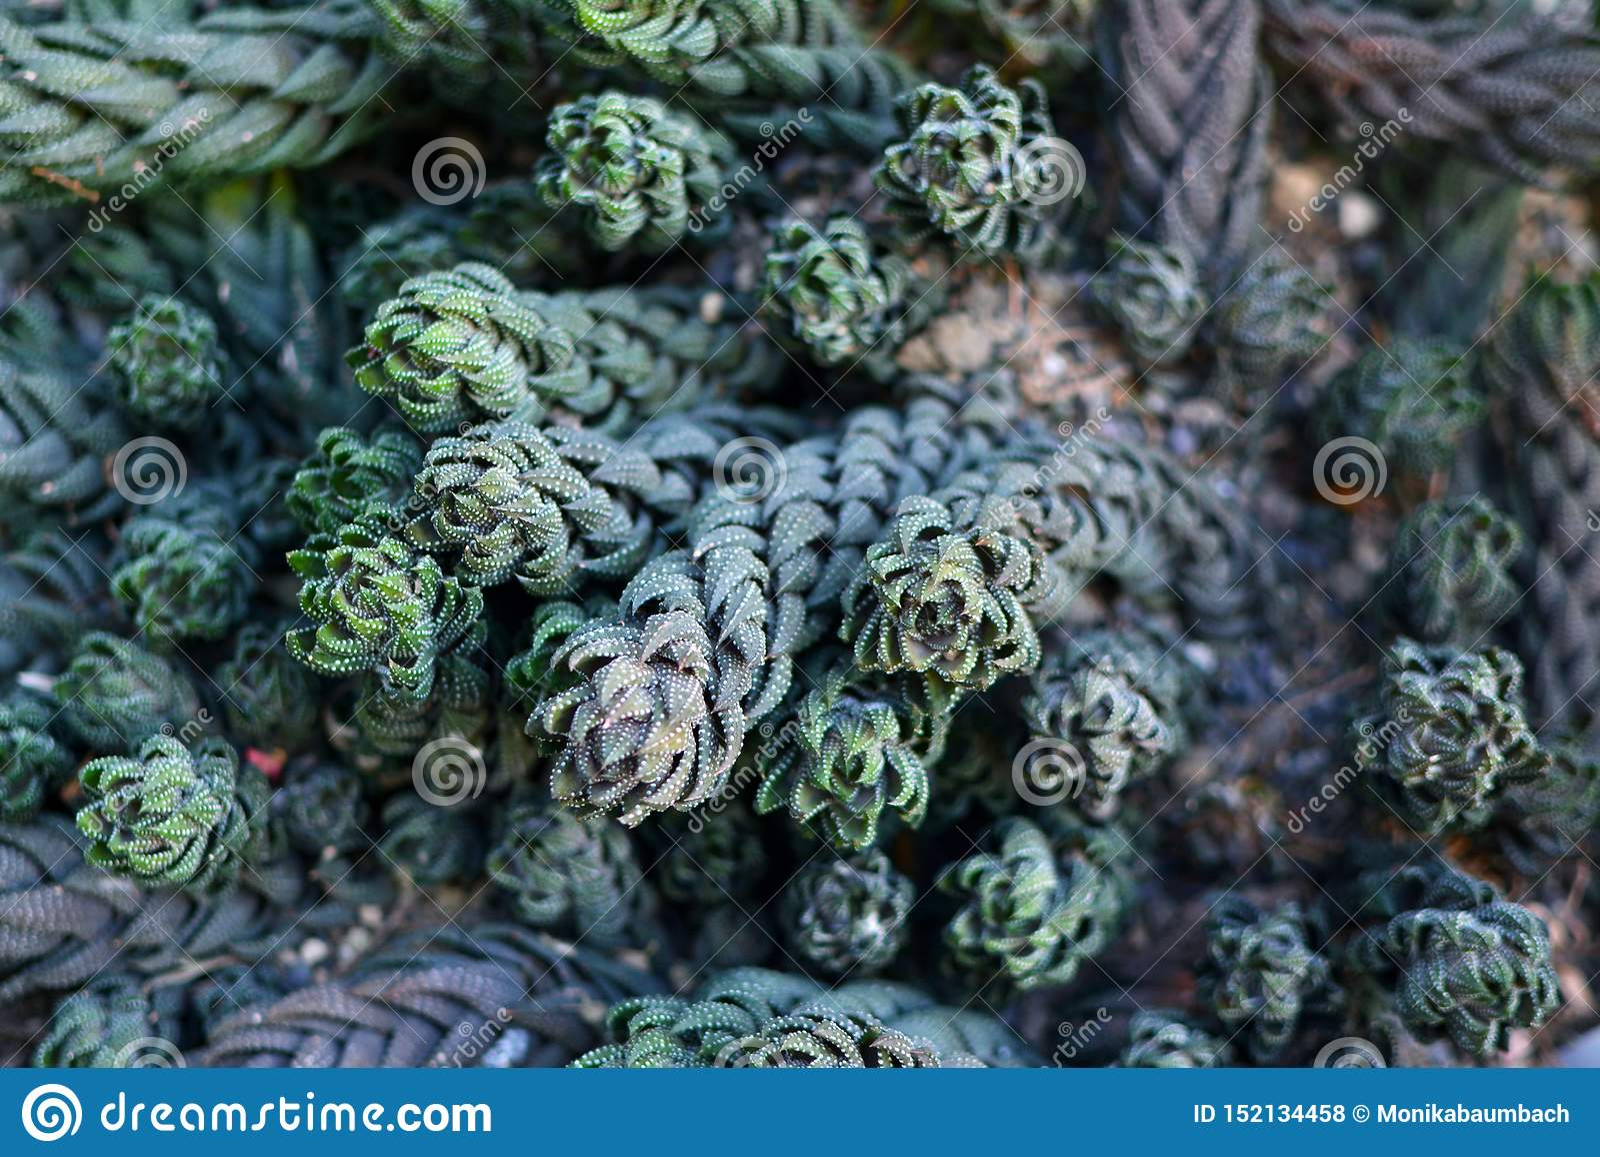 Terra coberta em plantas suculentos exóticas bonitas de Haworthiopsis Reinwardtii